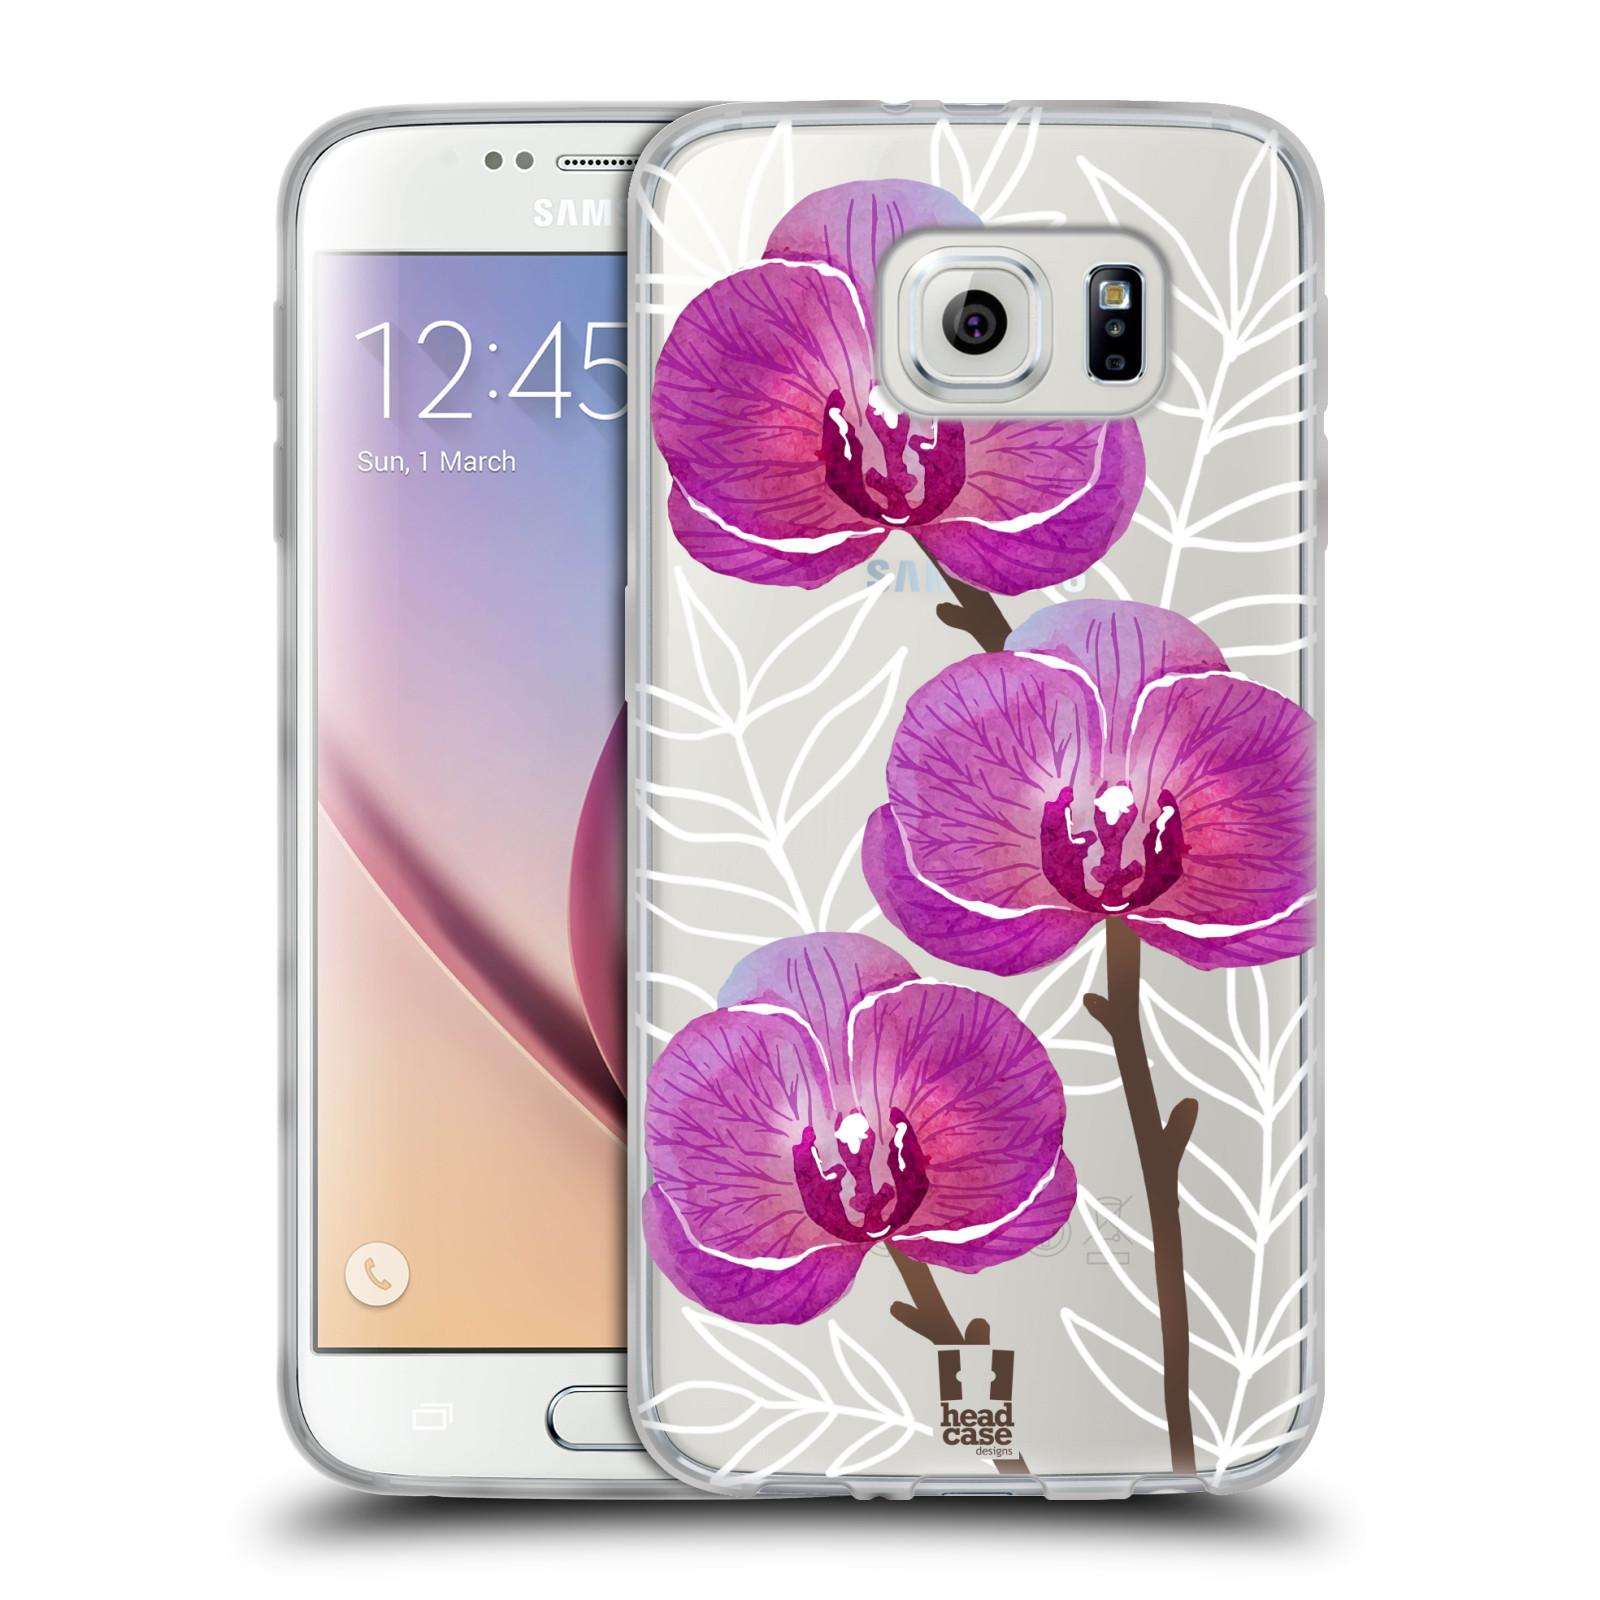 Silikonové pouzdro na mobil Samsung Galaxy S6 - Head Case - Hezoučké kvítky - průhledné